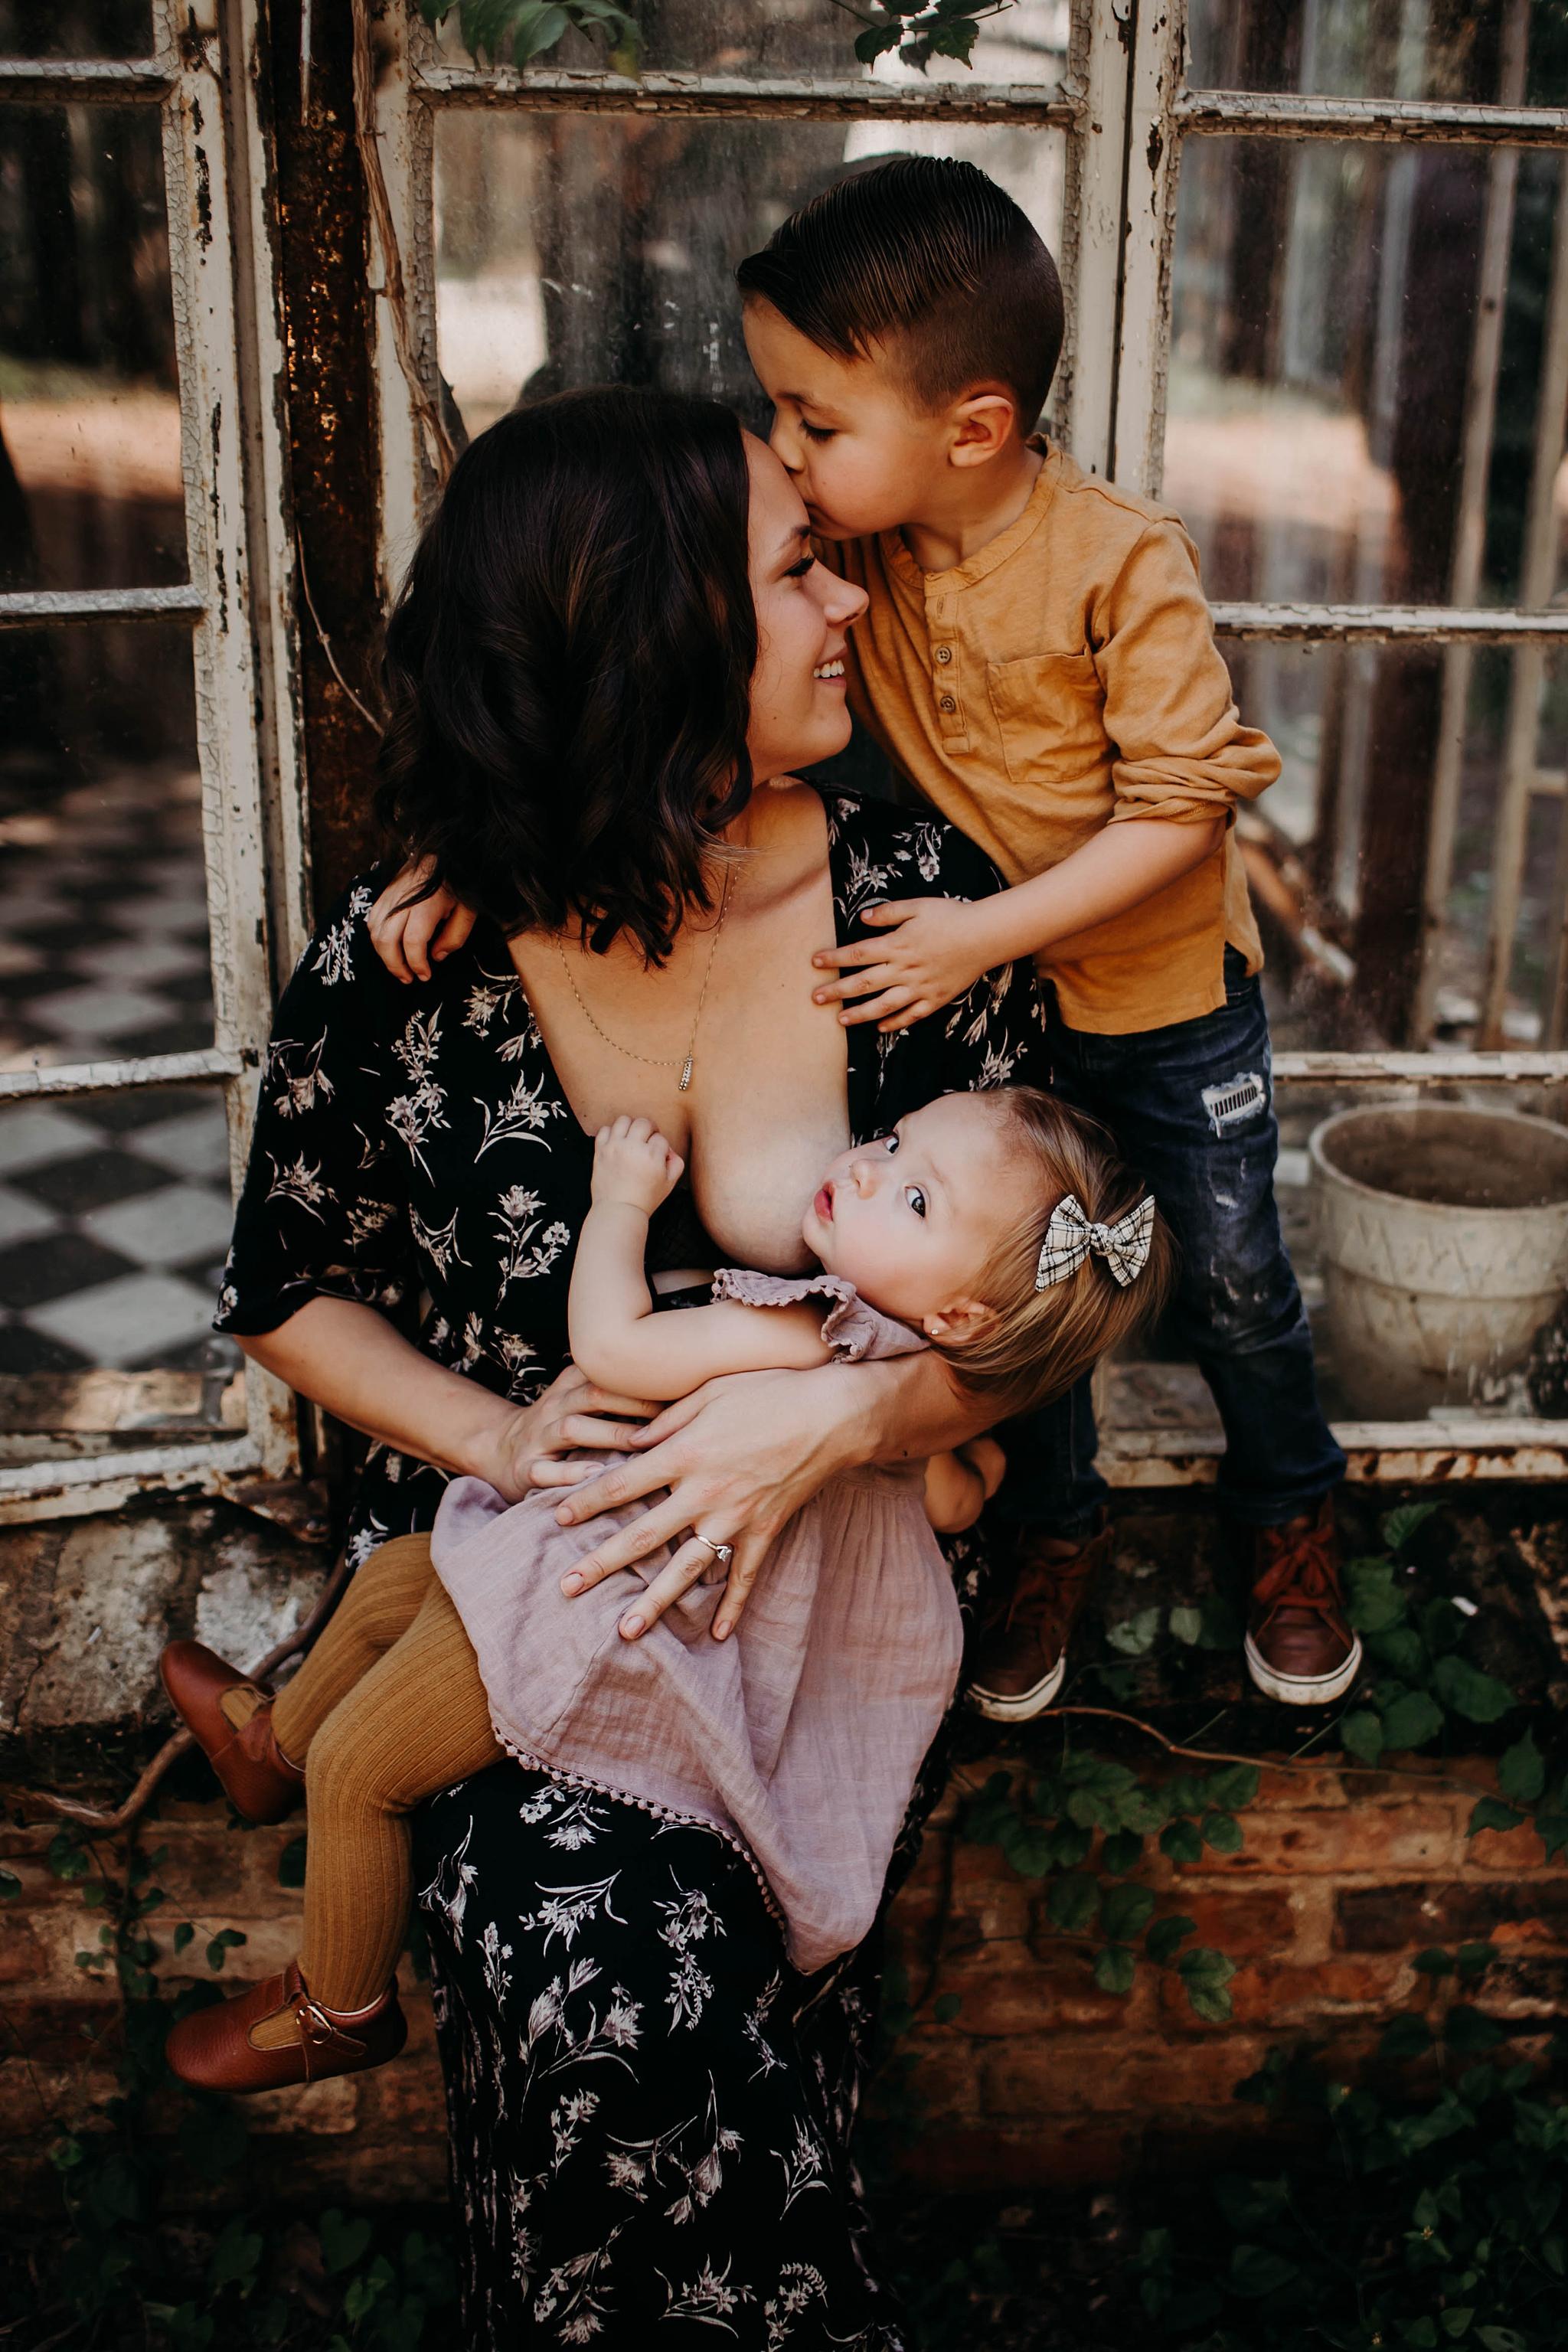 Luera-VMP-San-Antonio-Family-Photography-27_WEB.jpg